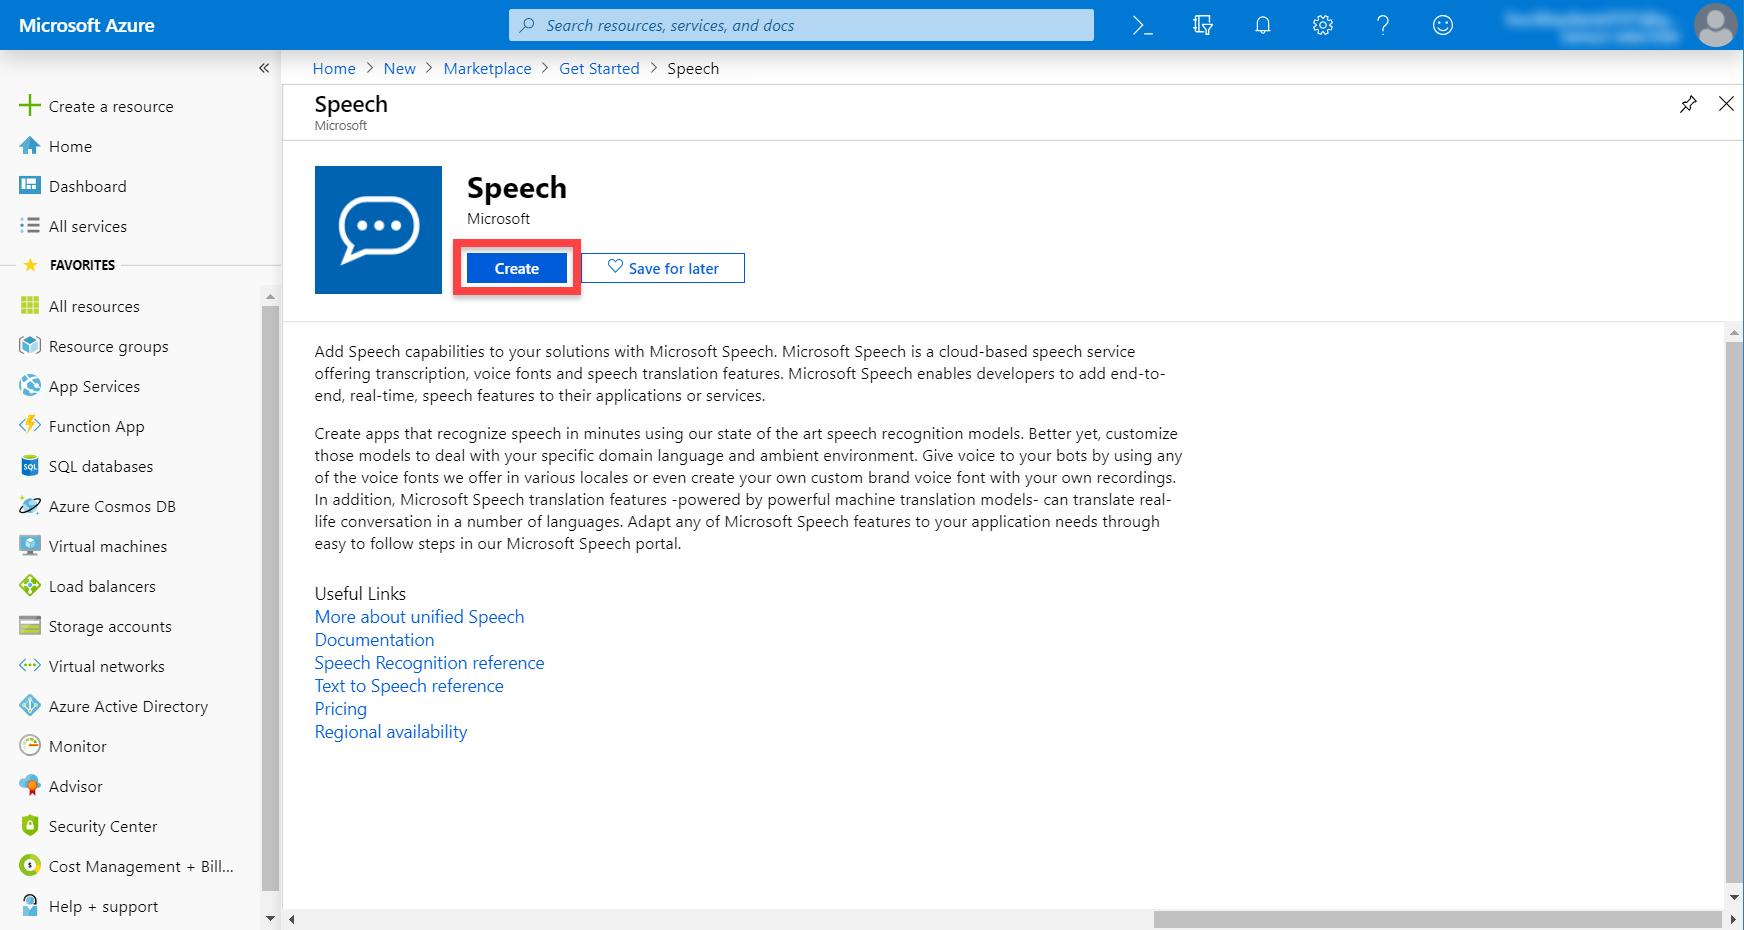 Microsoft Azure Speech service page